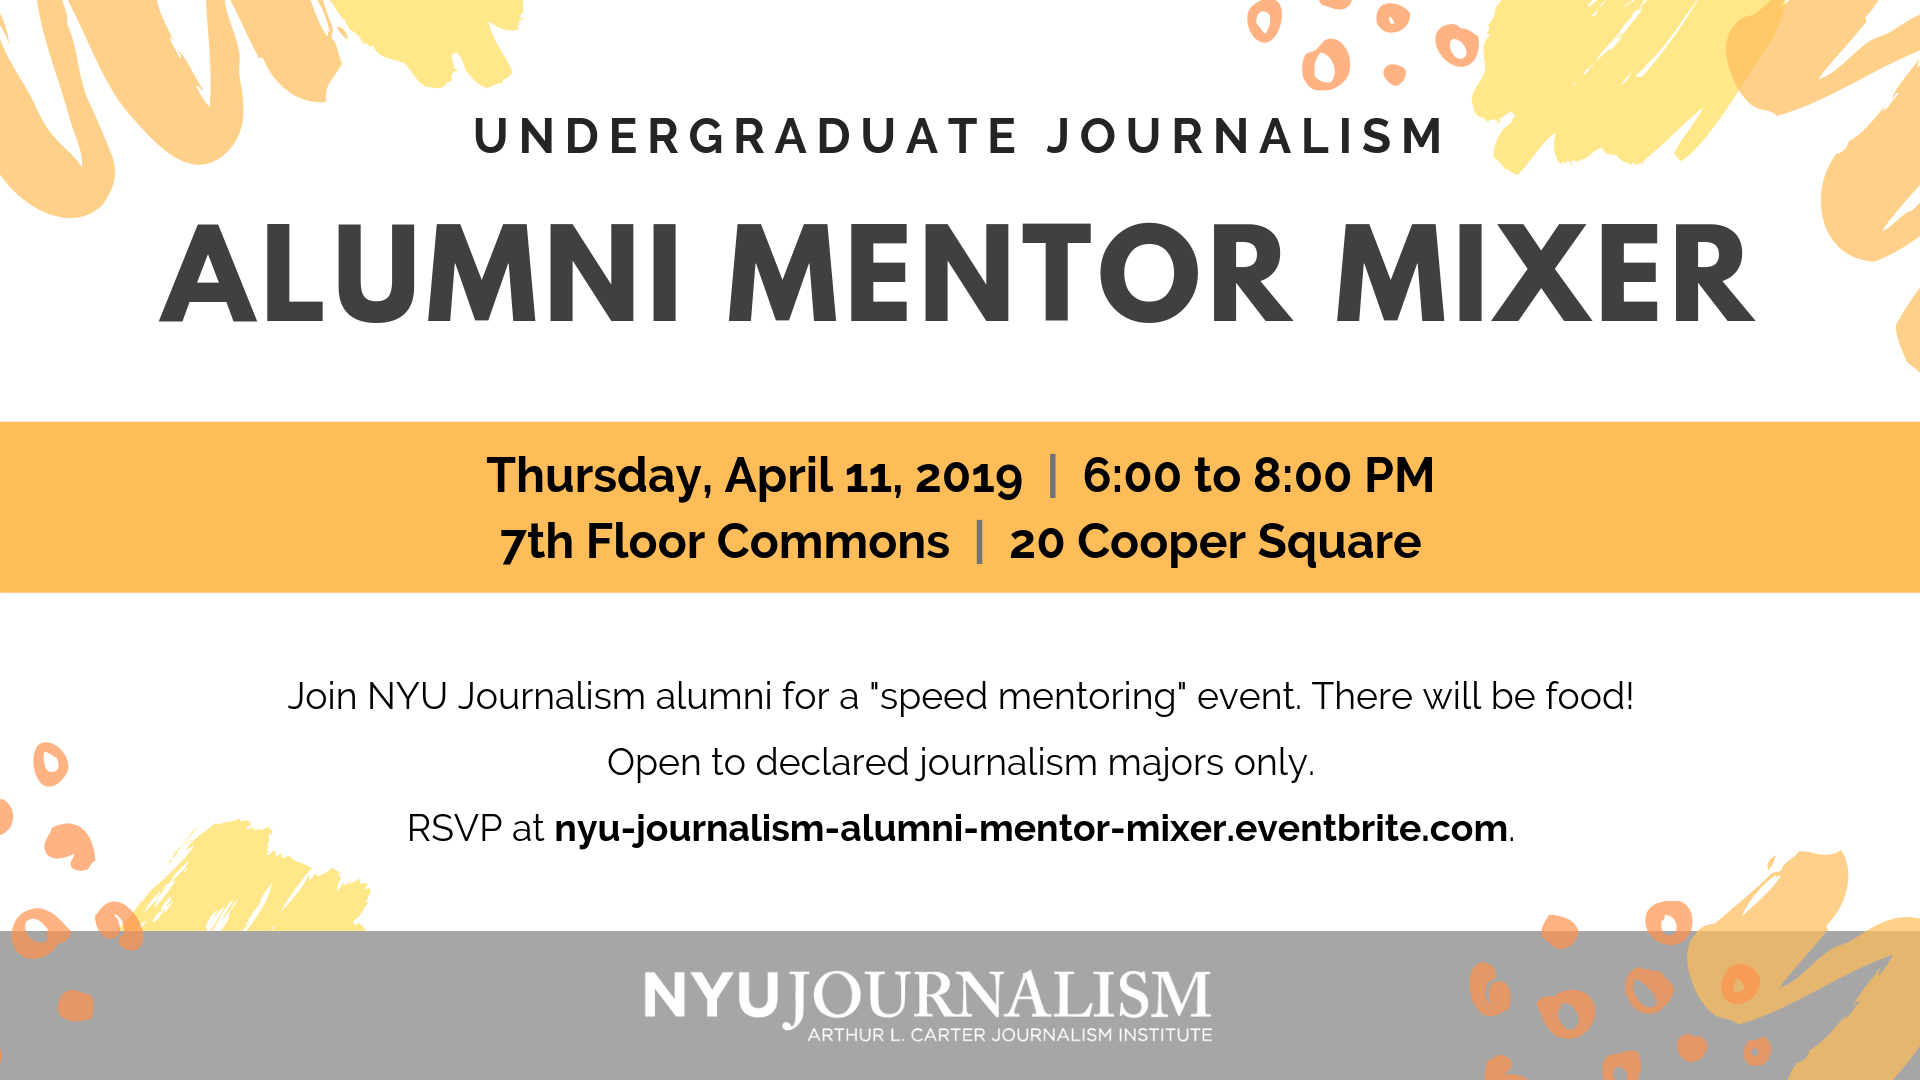 Undergraduate Journalism Alumni Mentor Mixer